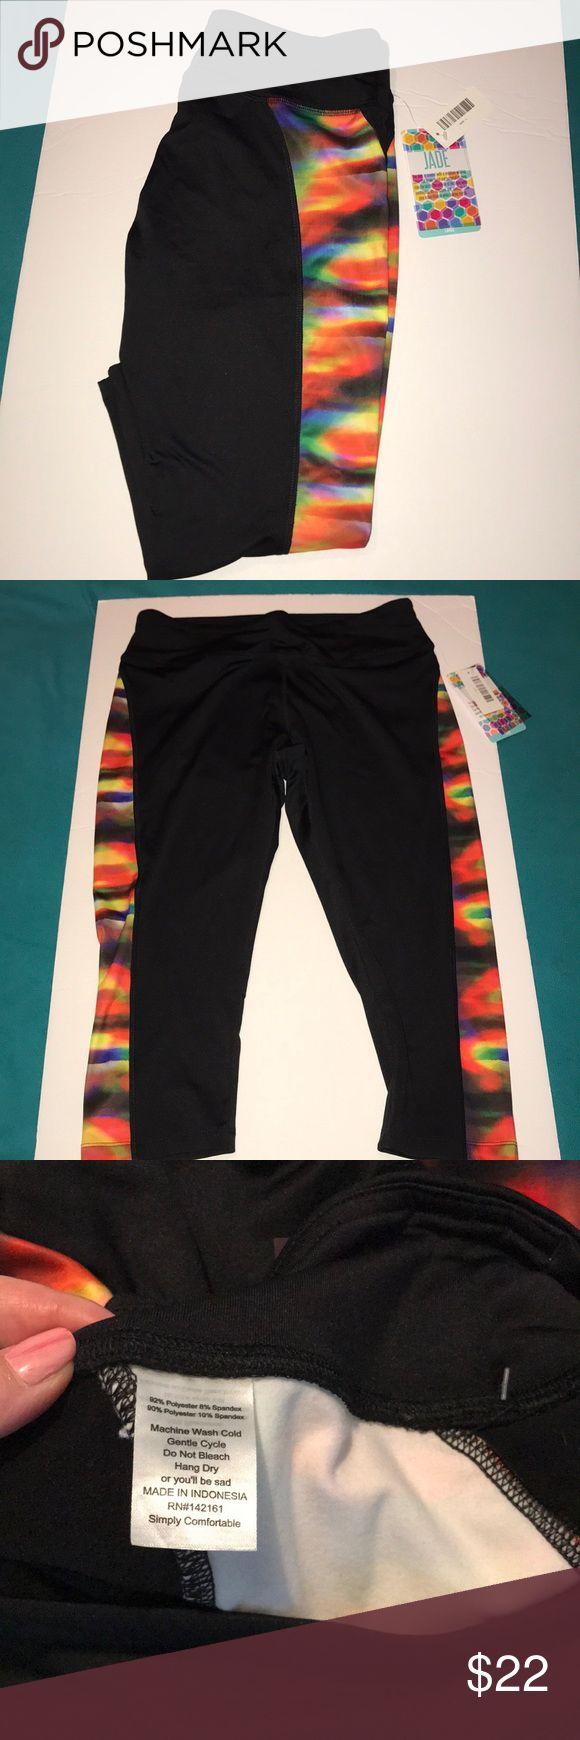 NWT Lularoe jade Capri workout pants NWT Lularoe jade Capri workout pants-these have a compression like typical workout pants do. Black with rainbow color sides. LuLaRoe Pants Capris